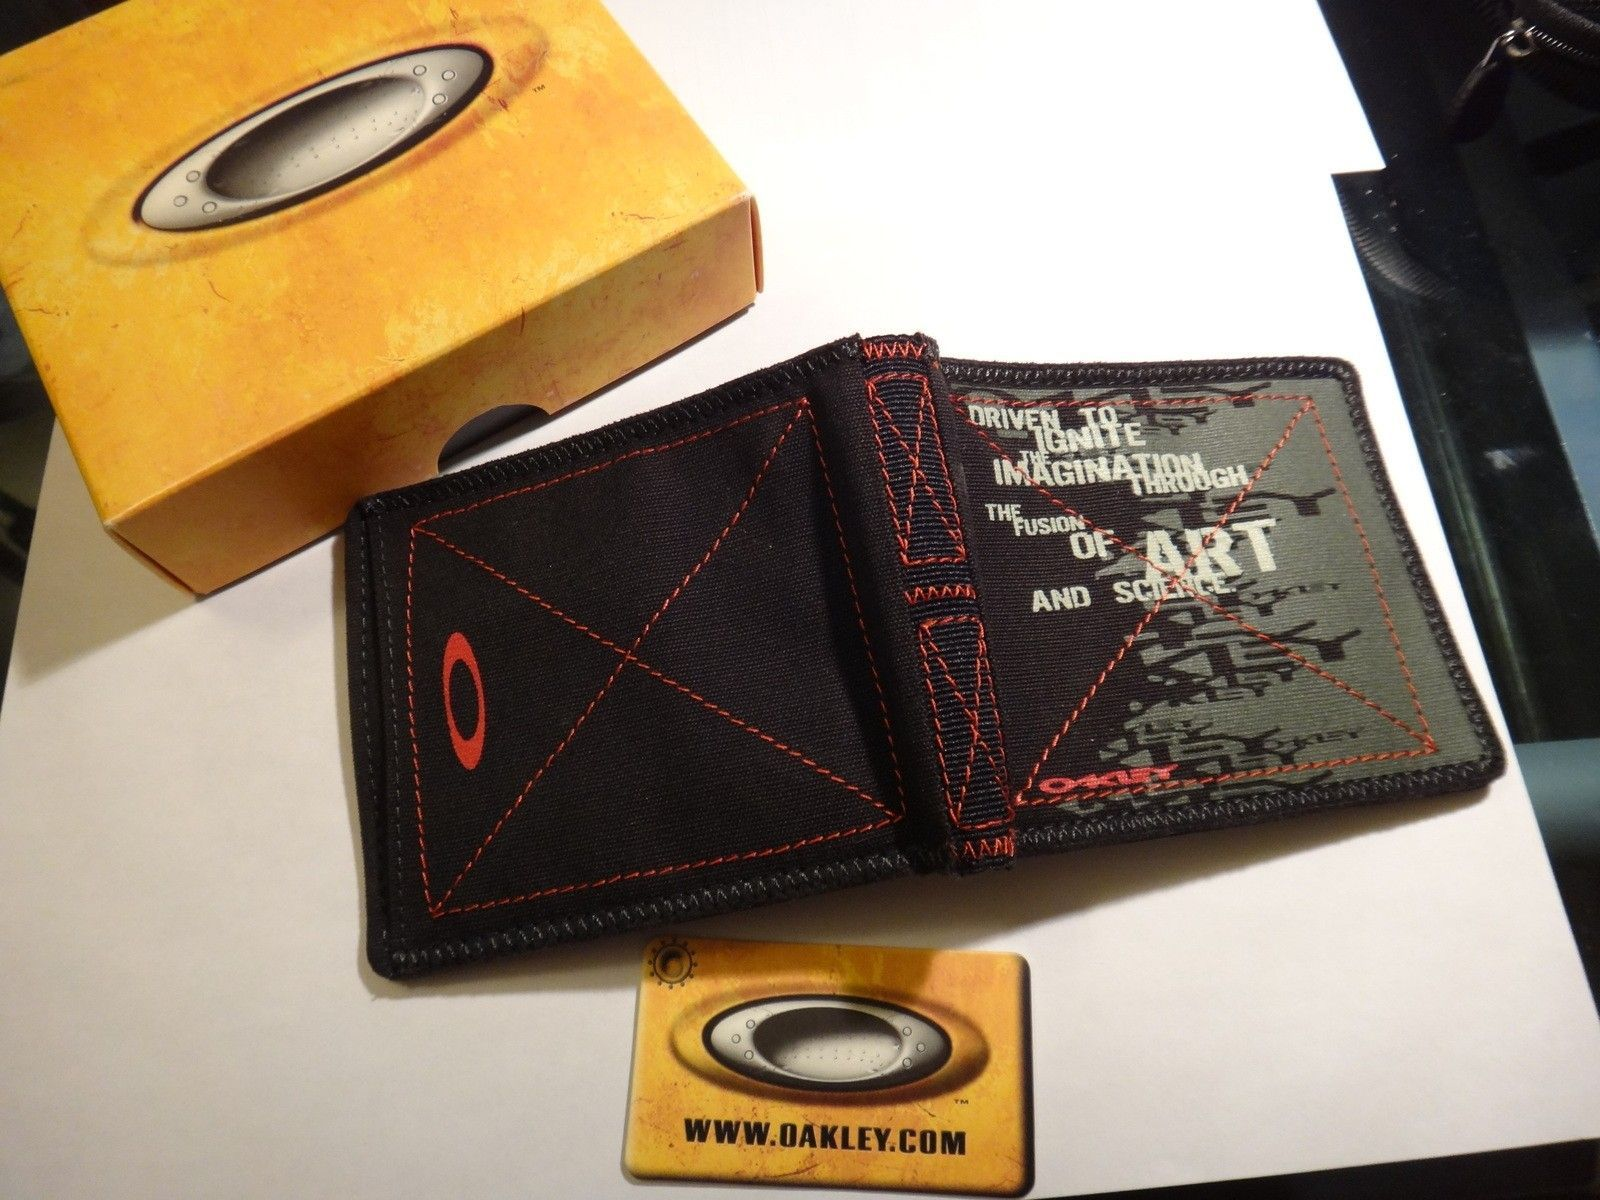 1st gen juliet, Juliet ruby lenses, snow goggle lens (A frame), juliet parts, wallet, boots - DSC07180.JPG